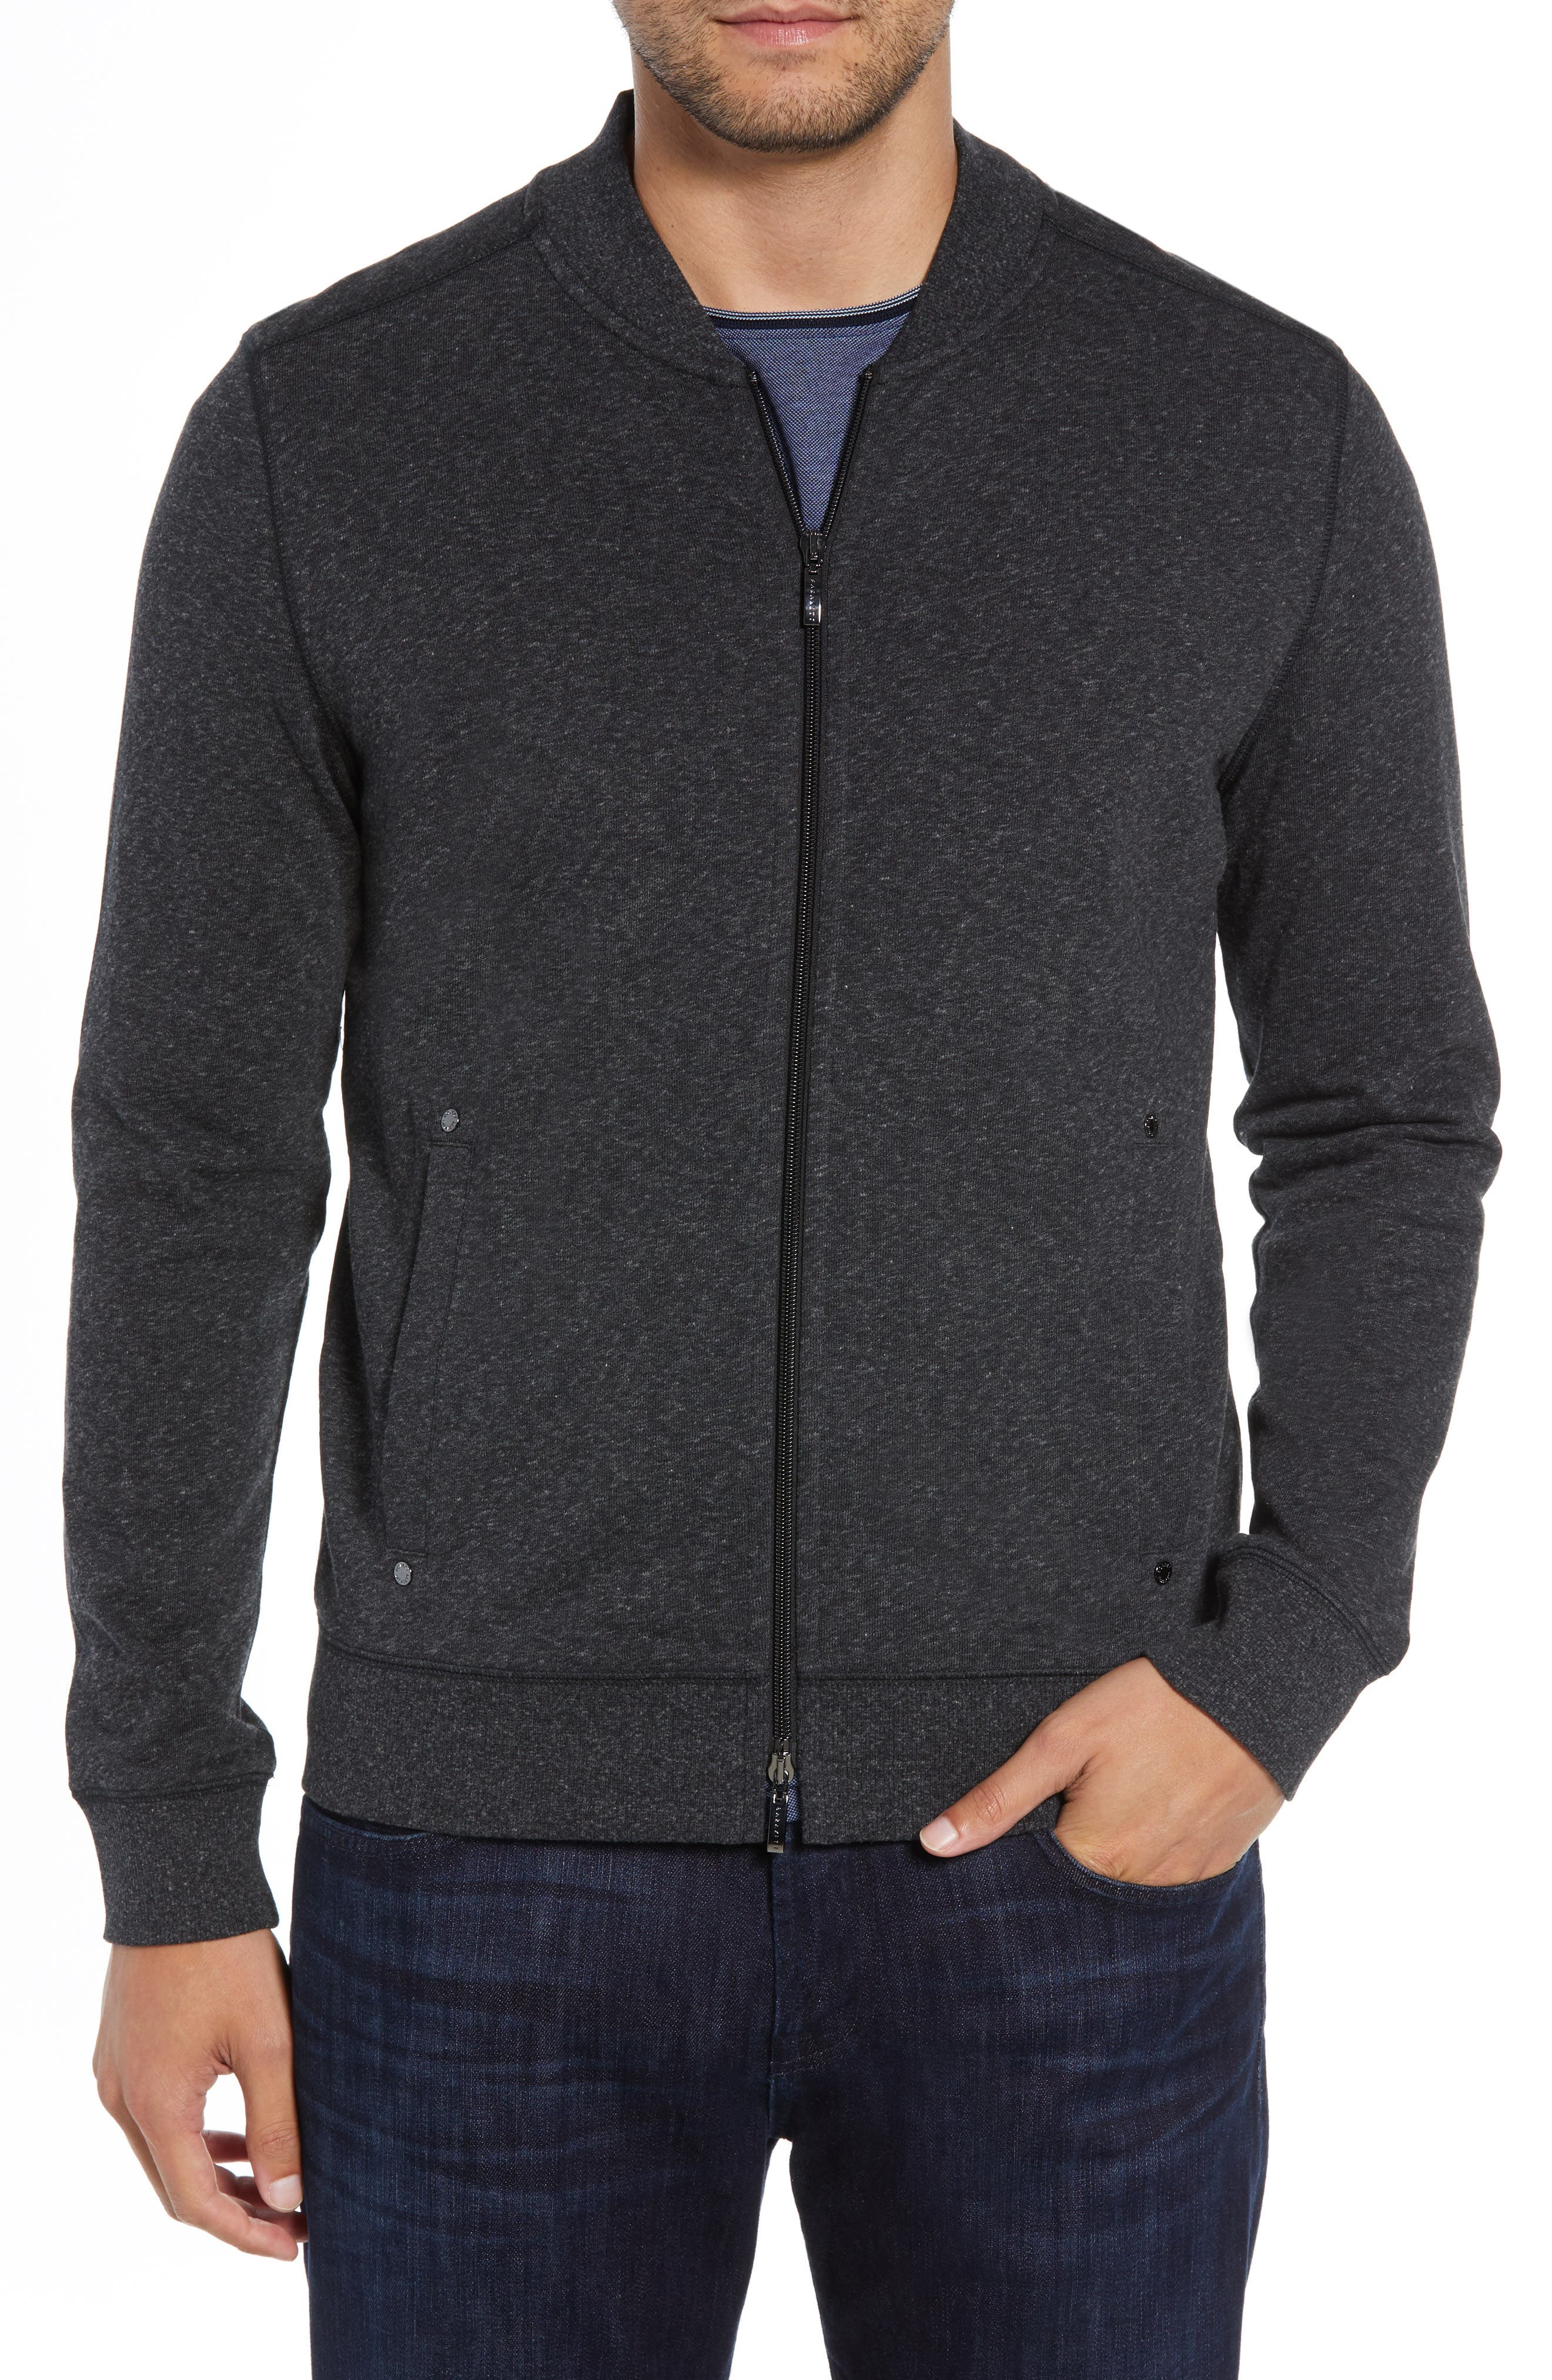 ROBERT BARAKETT, Front Zip Knit Jacket, Alternate thumbnail 4, color, BLACK